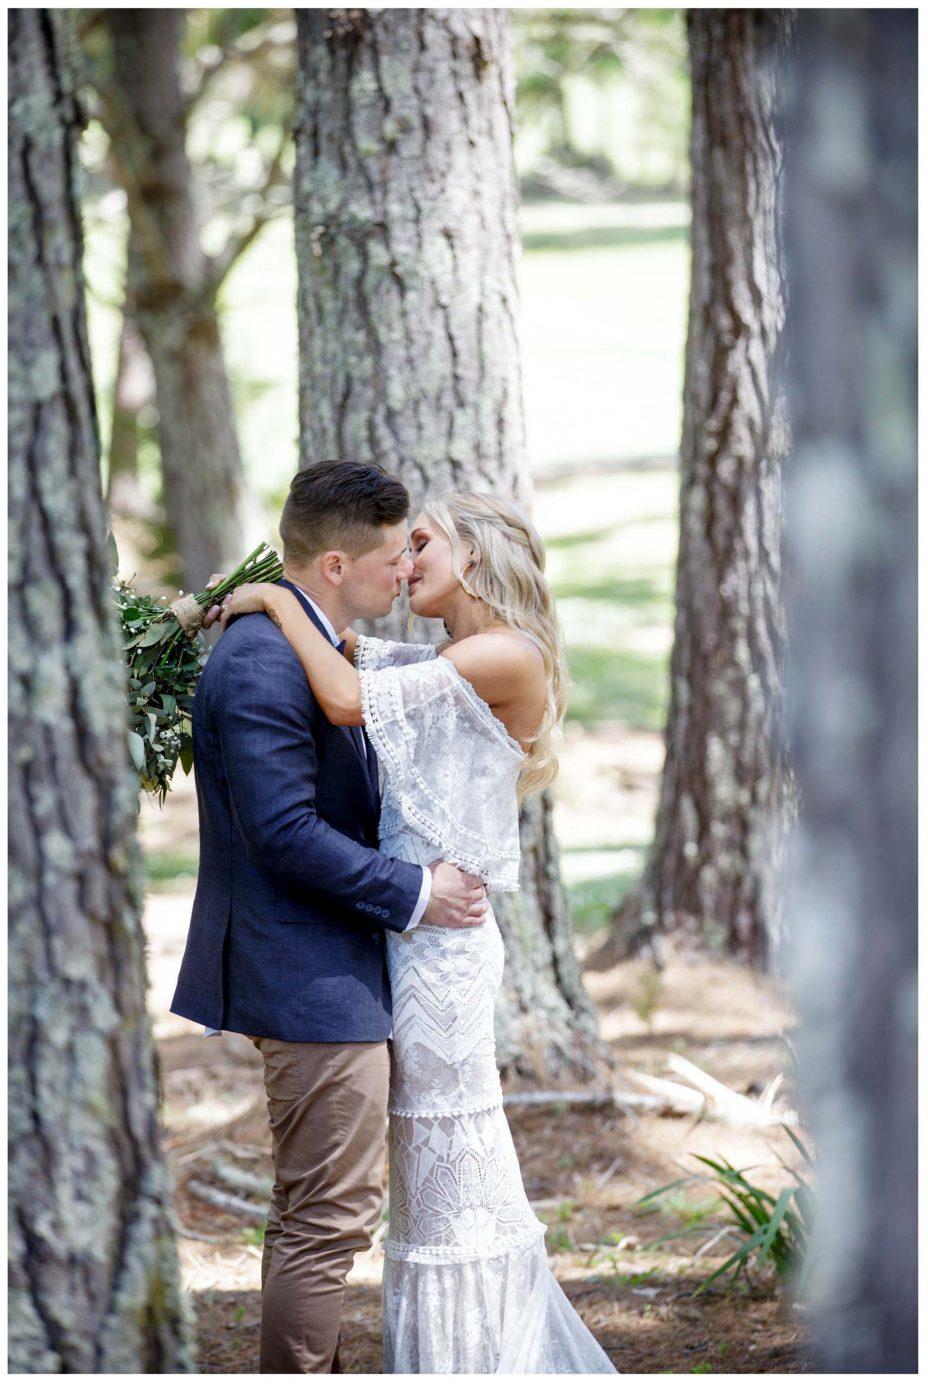 Aussie Bride and groom kiss among the trees, Murawai Beech wedding